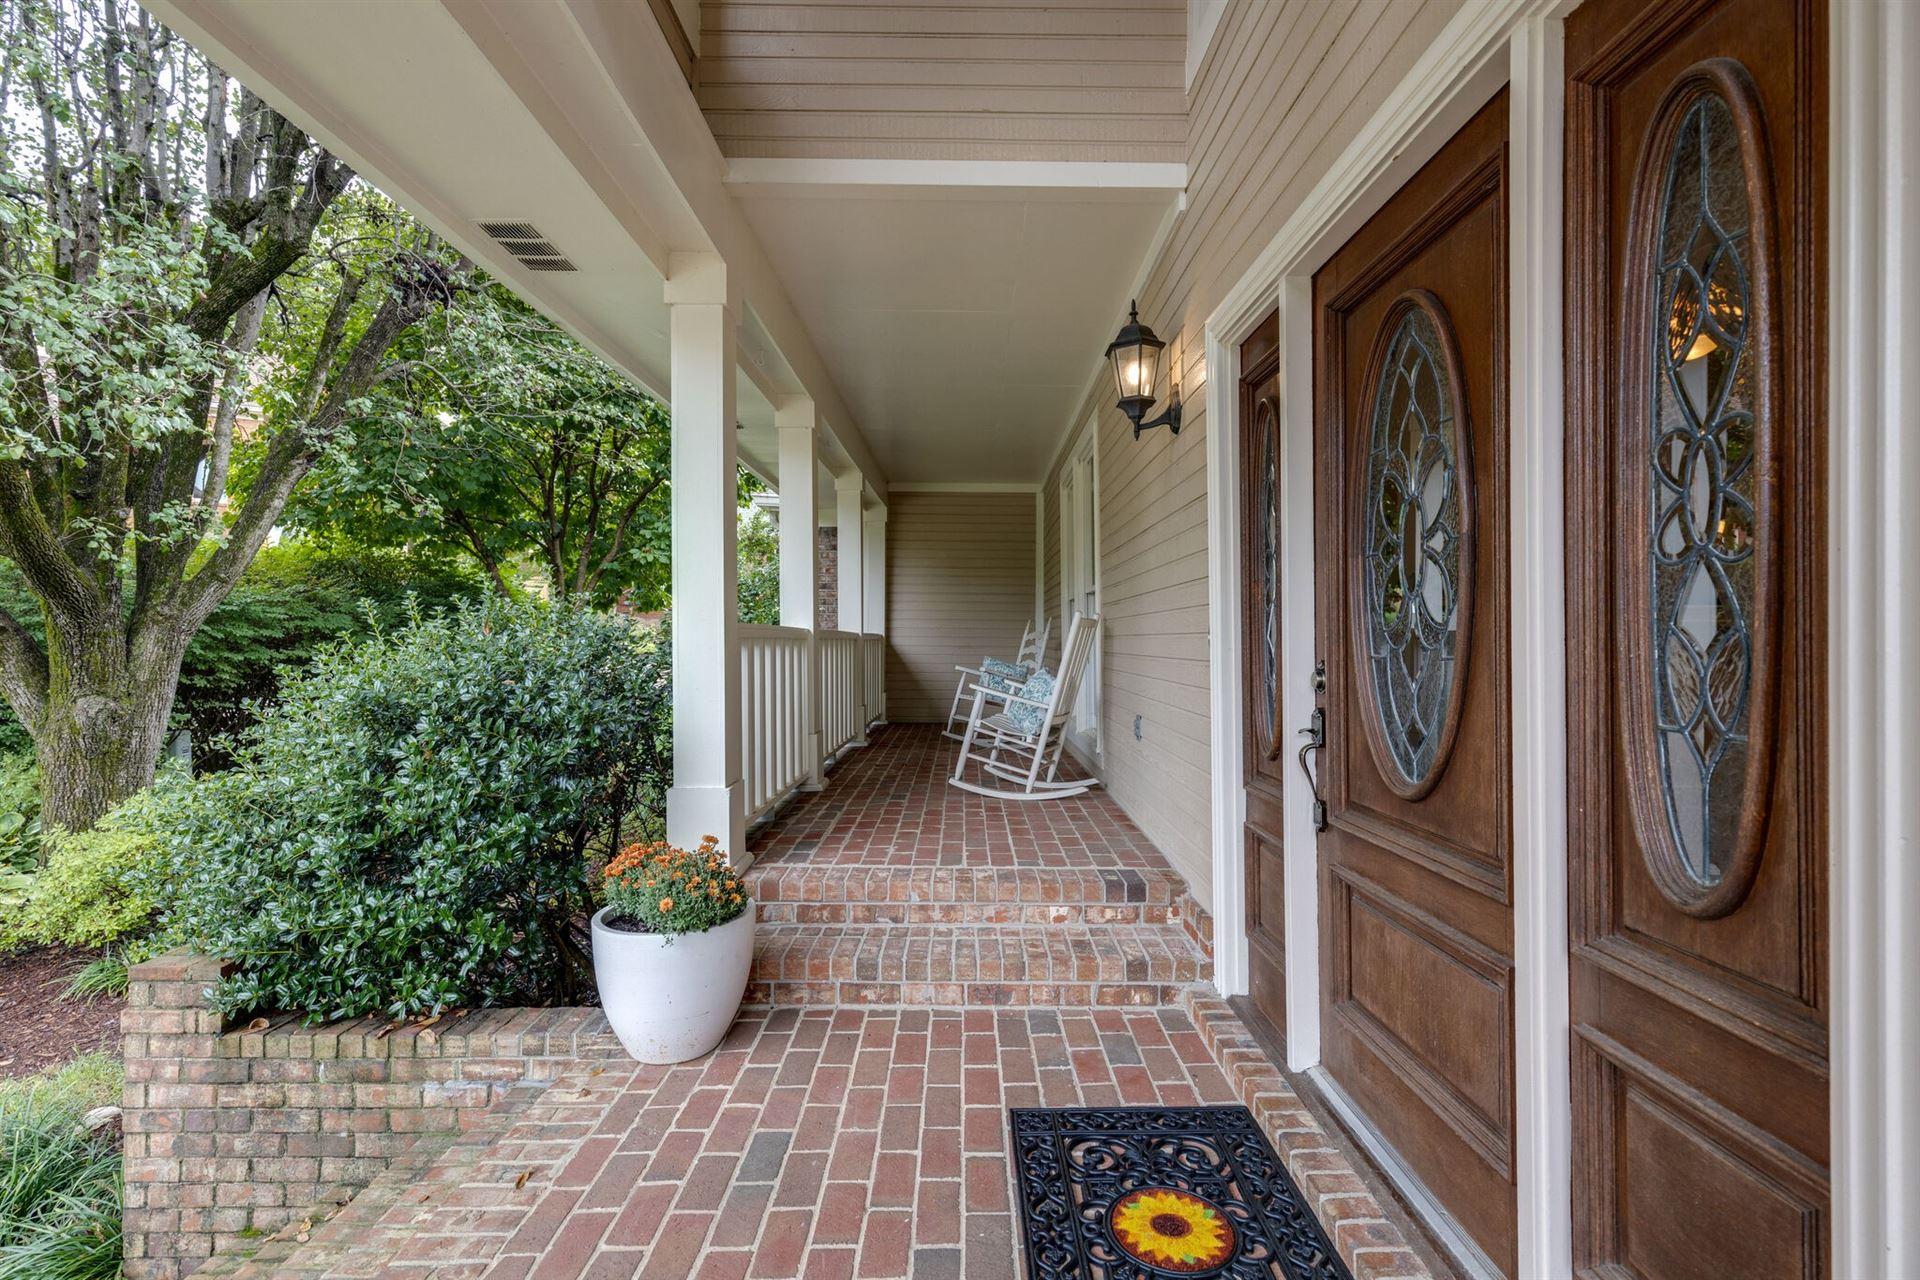 Photo of 904 Stone Box Ct, Brentwood, TN 37027 (MLS # 2291814)